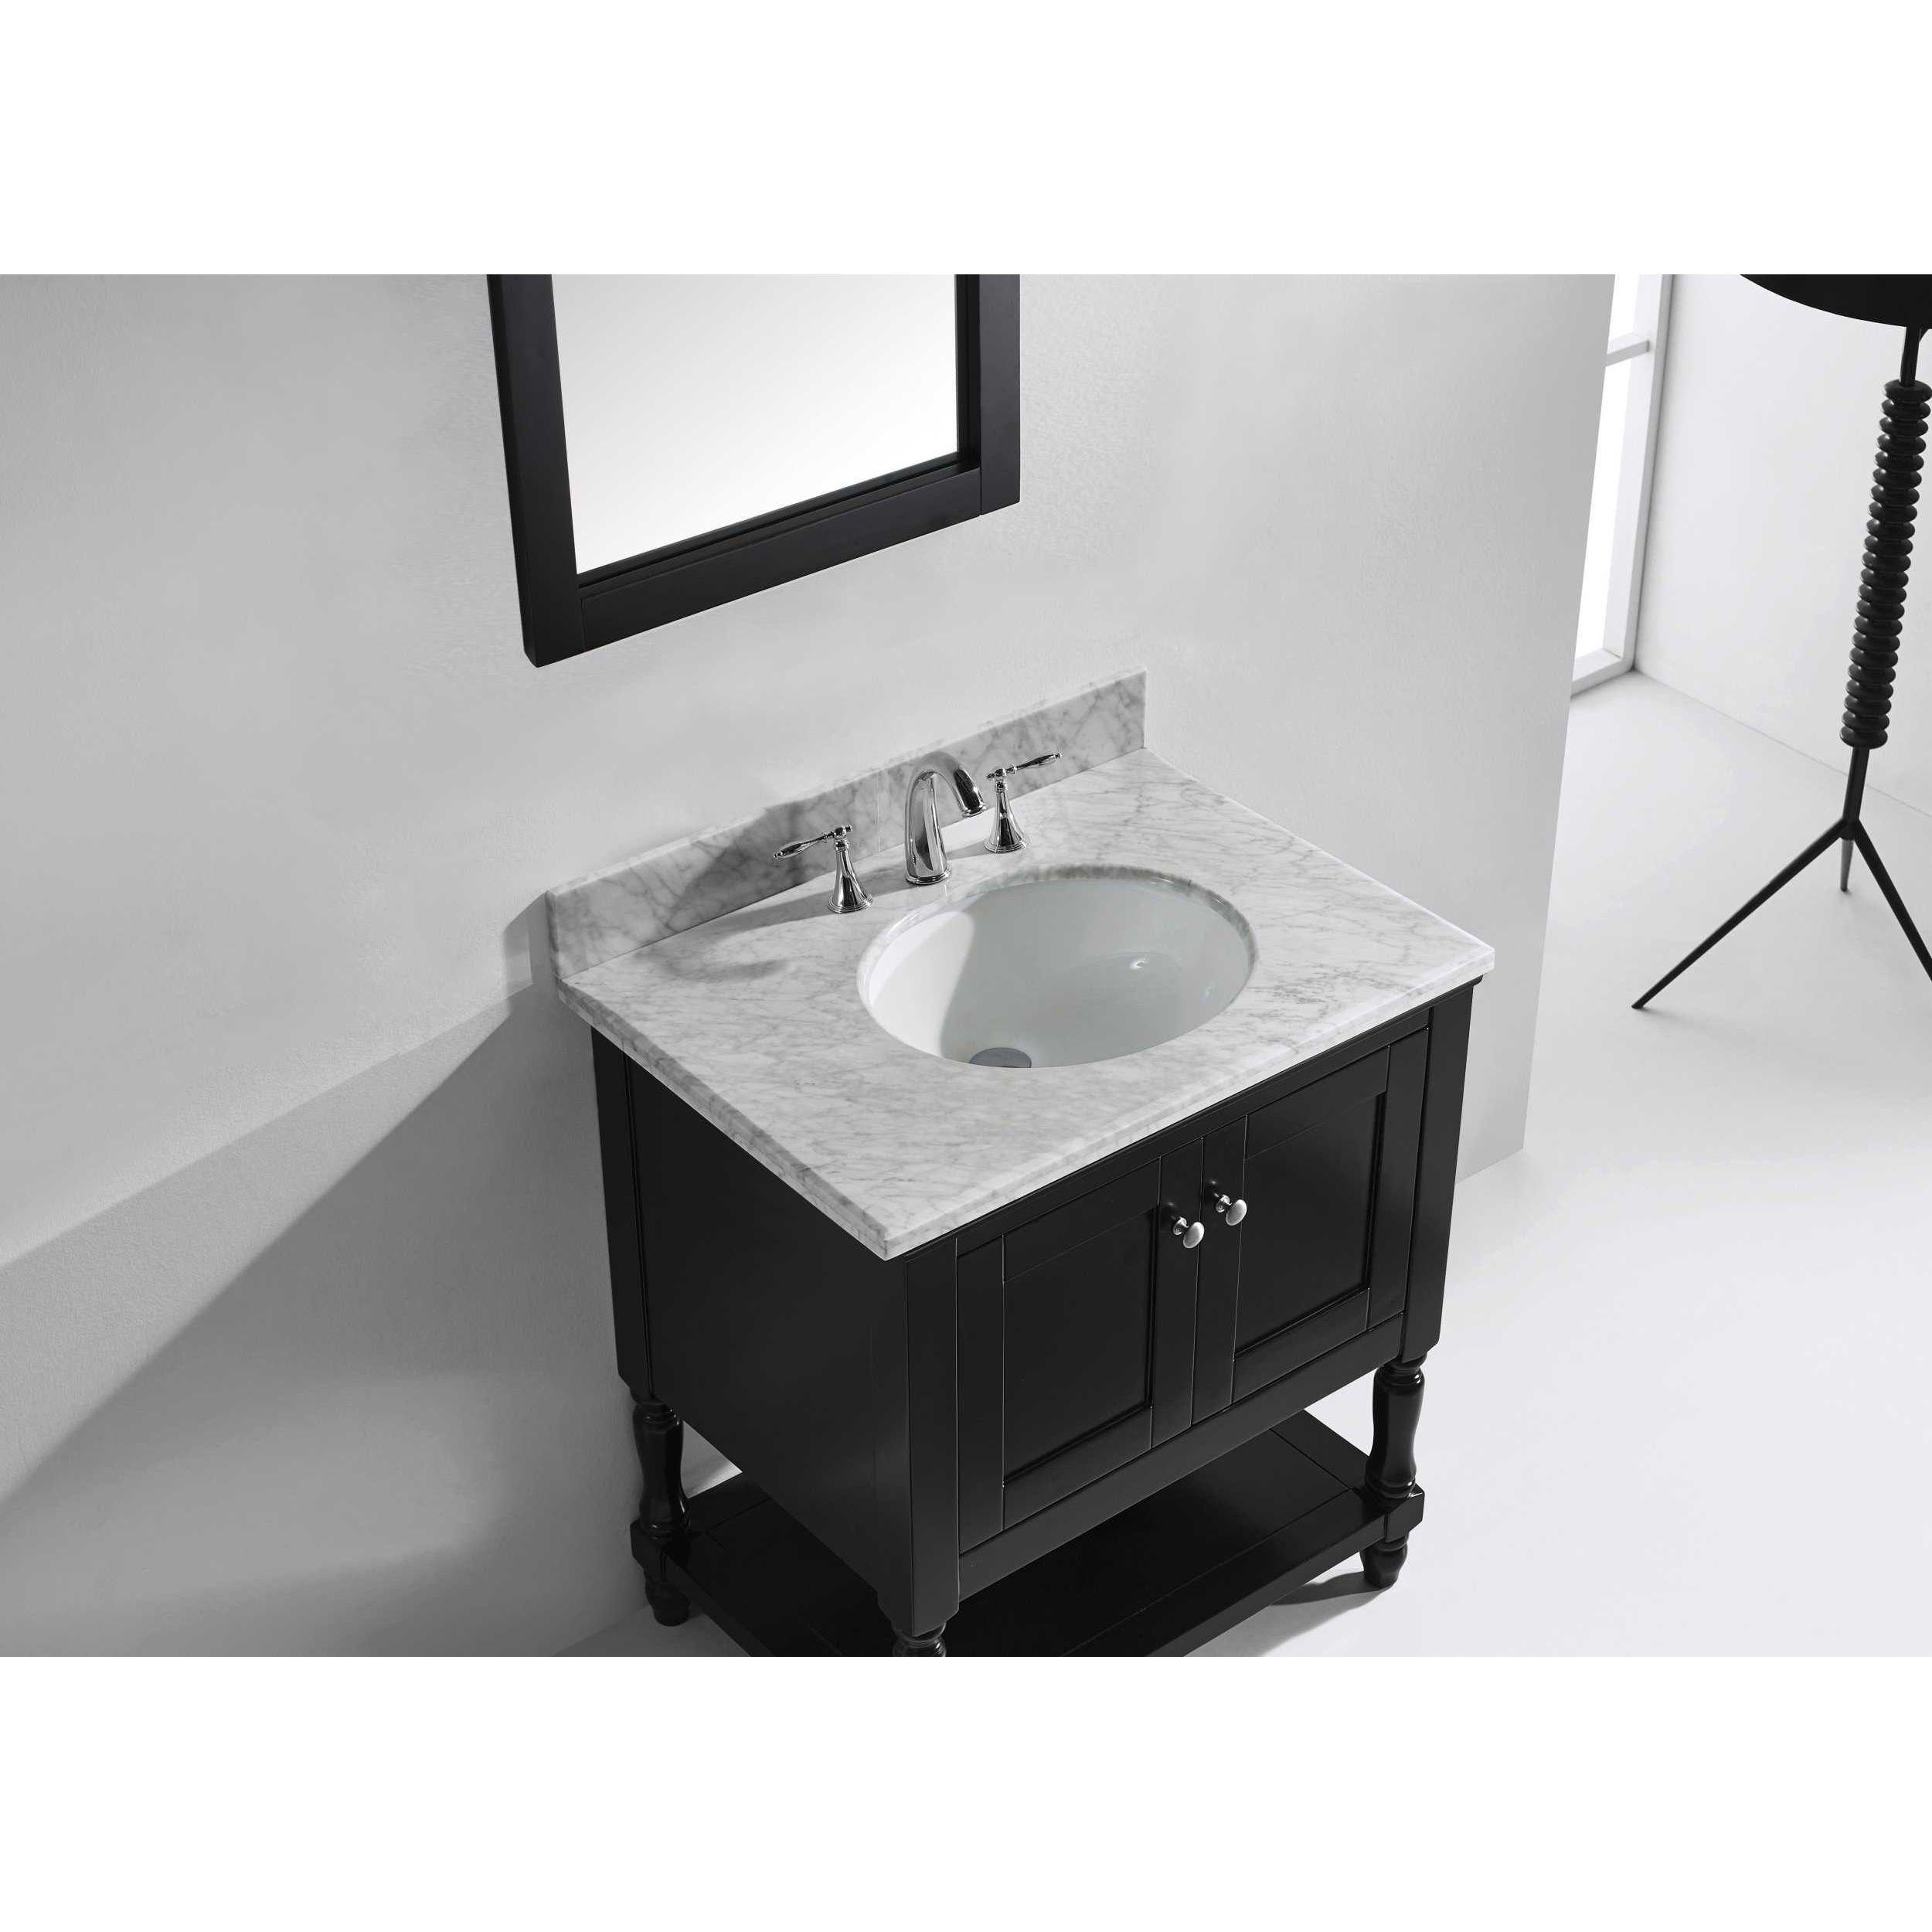 Virtu usa julianna 32 inch single bathroom vanity